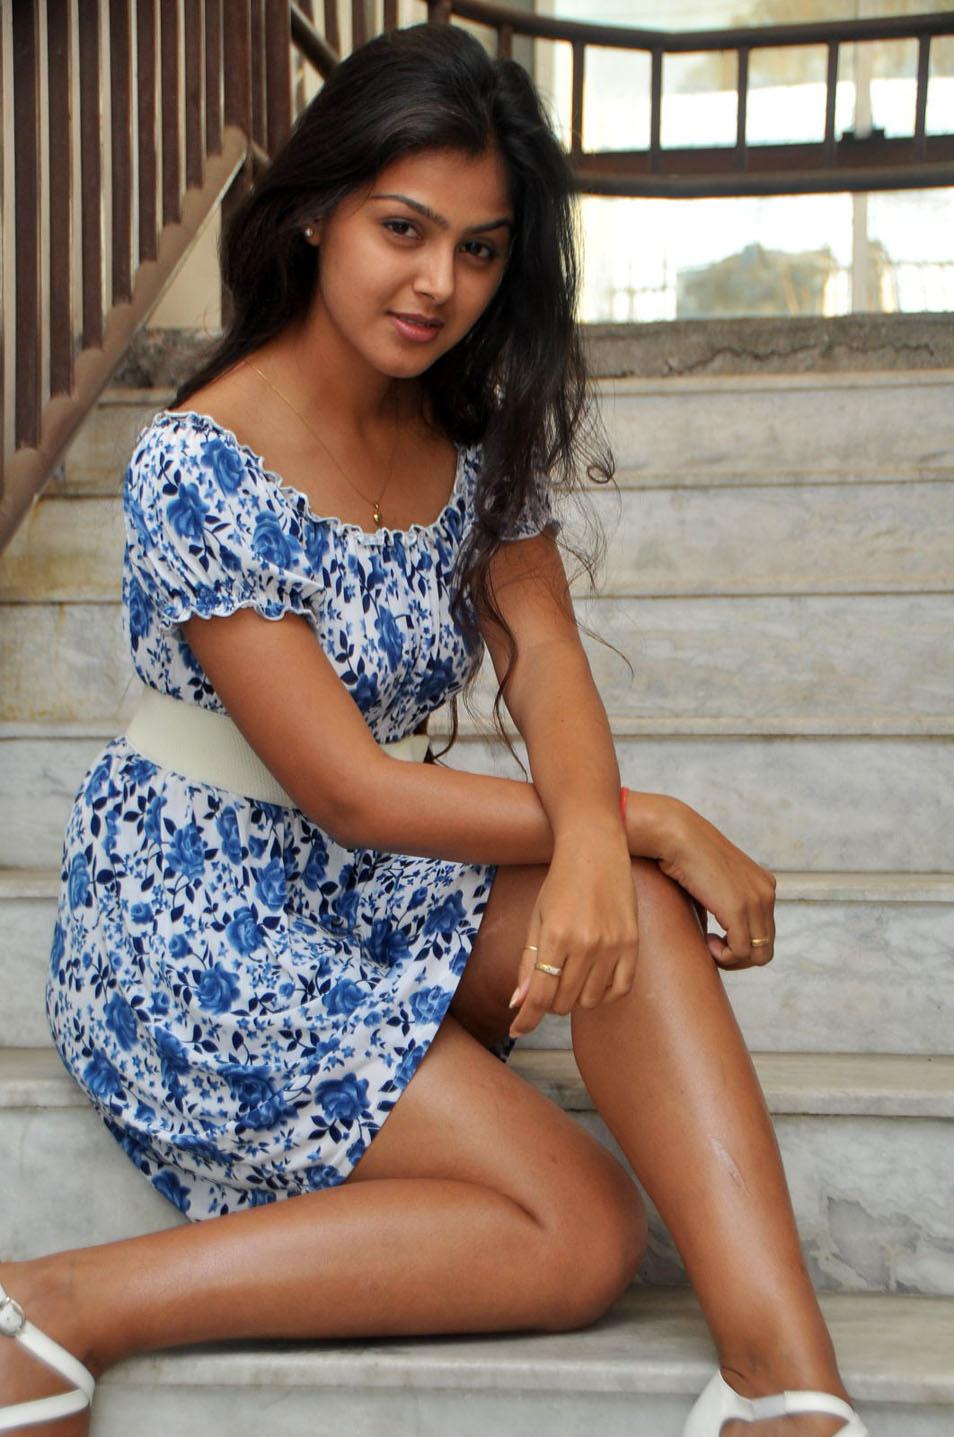 Anusha sharma hot sexy booty - 2 4